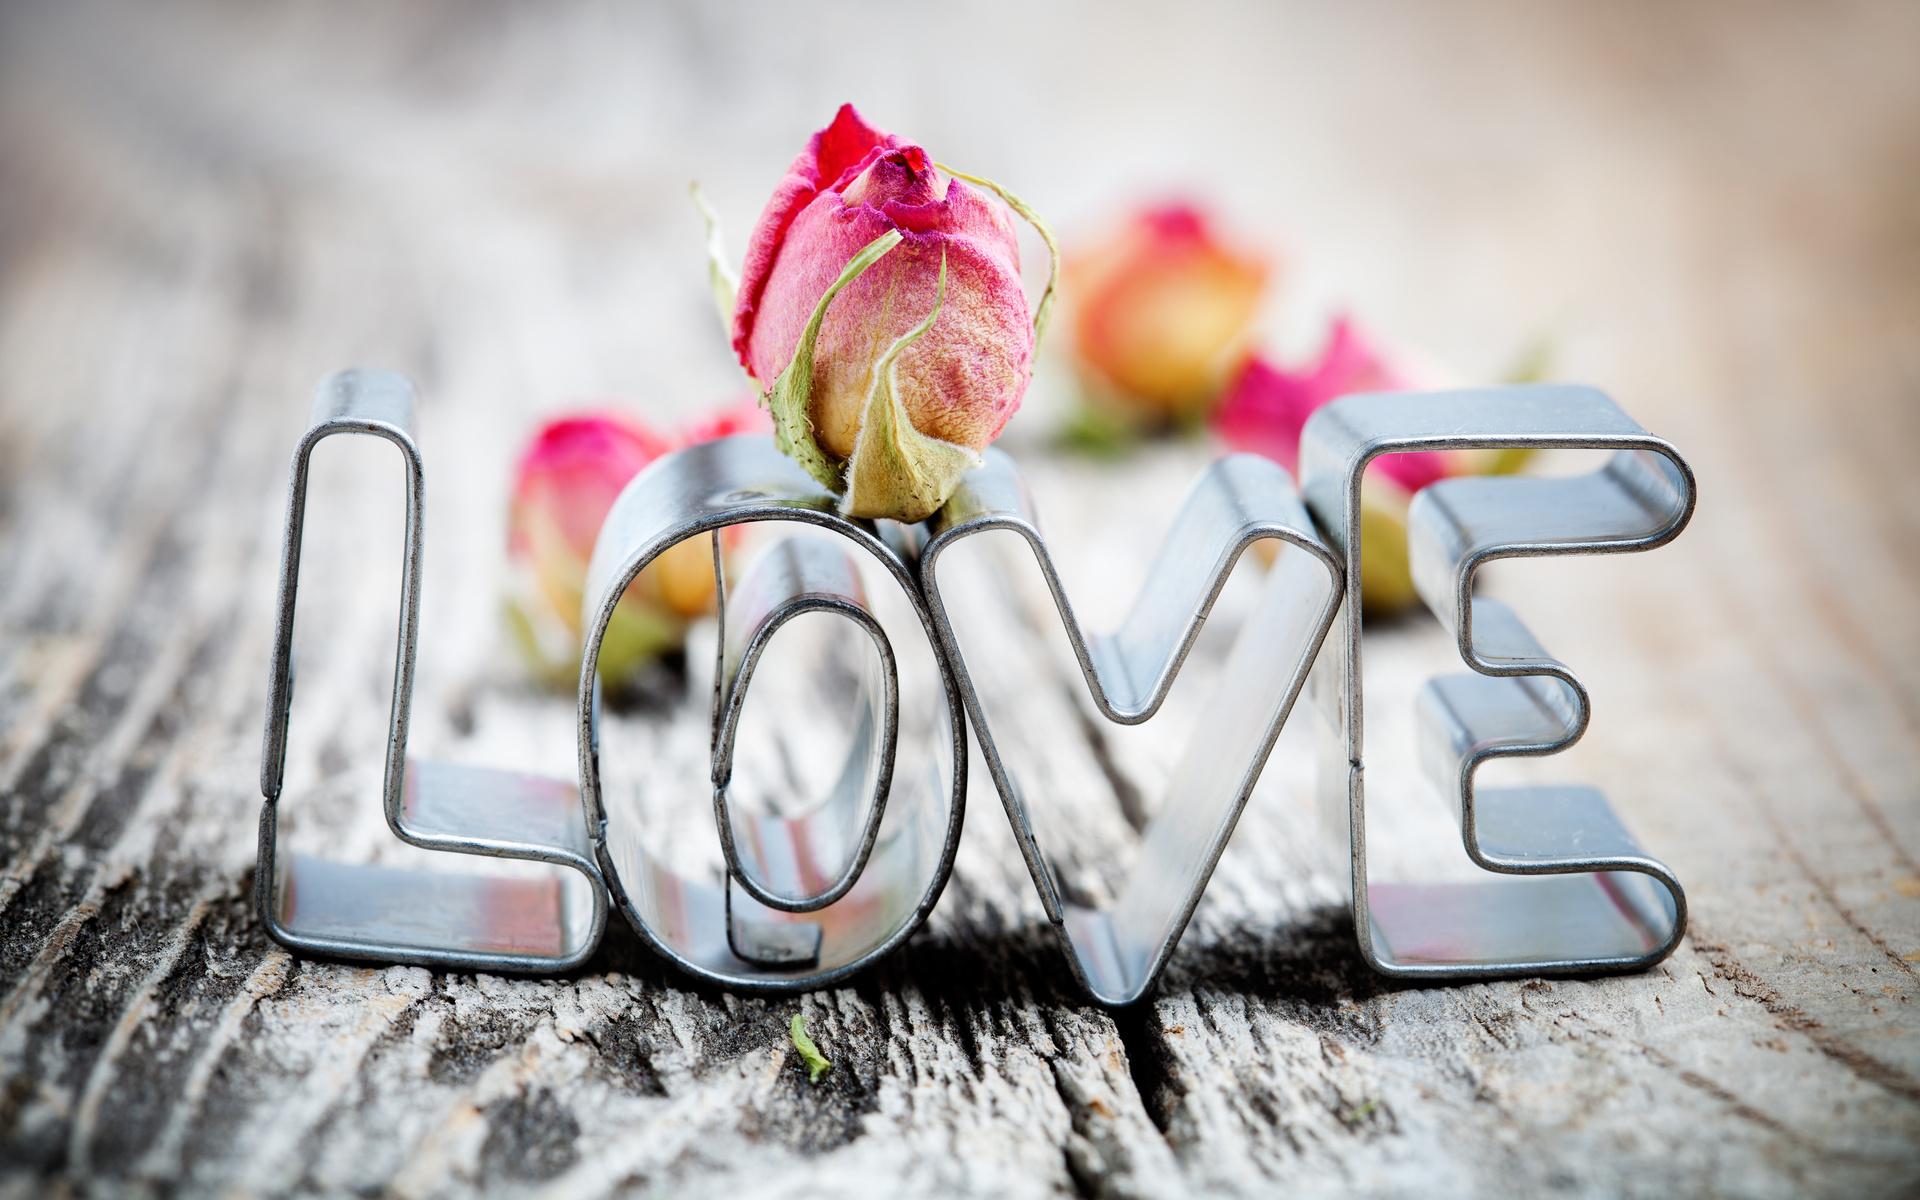 Love Hd Wallpaper Background Image 1920x1200 Id305564